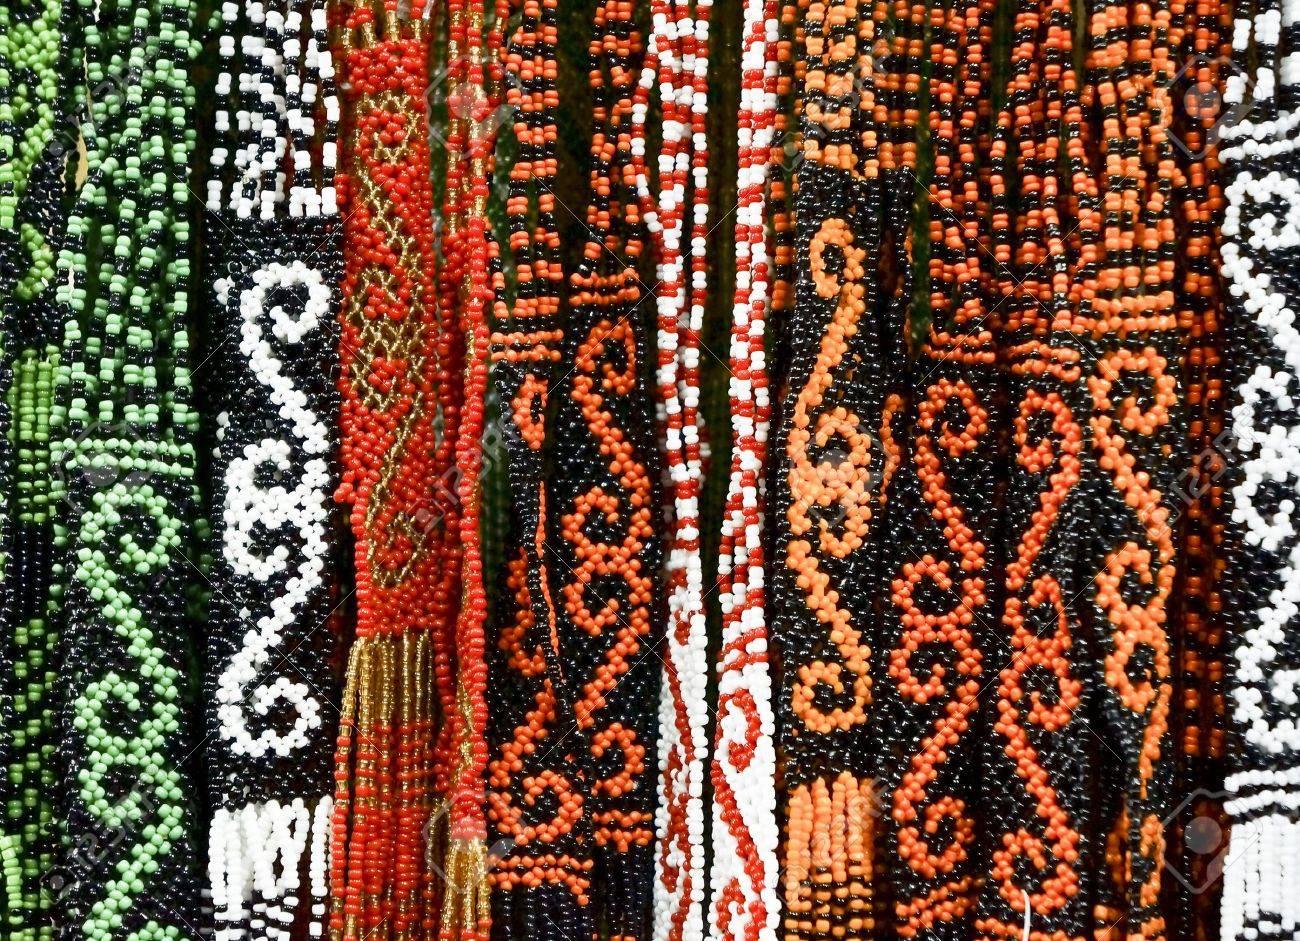 Pattern of Borneo Bead Crafts - 15013619